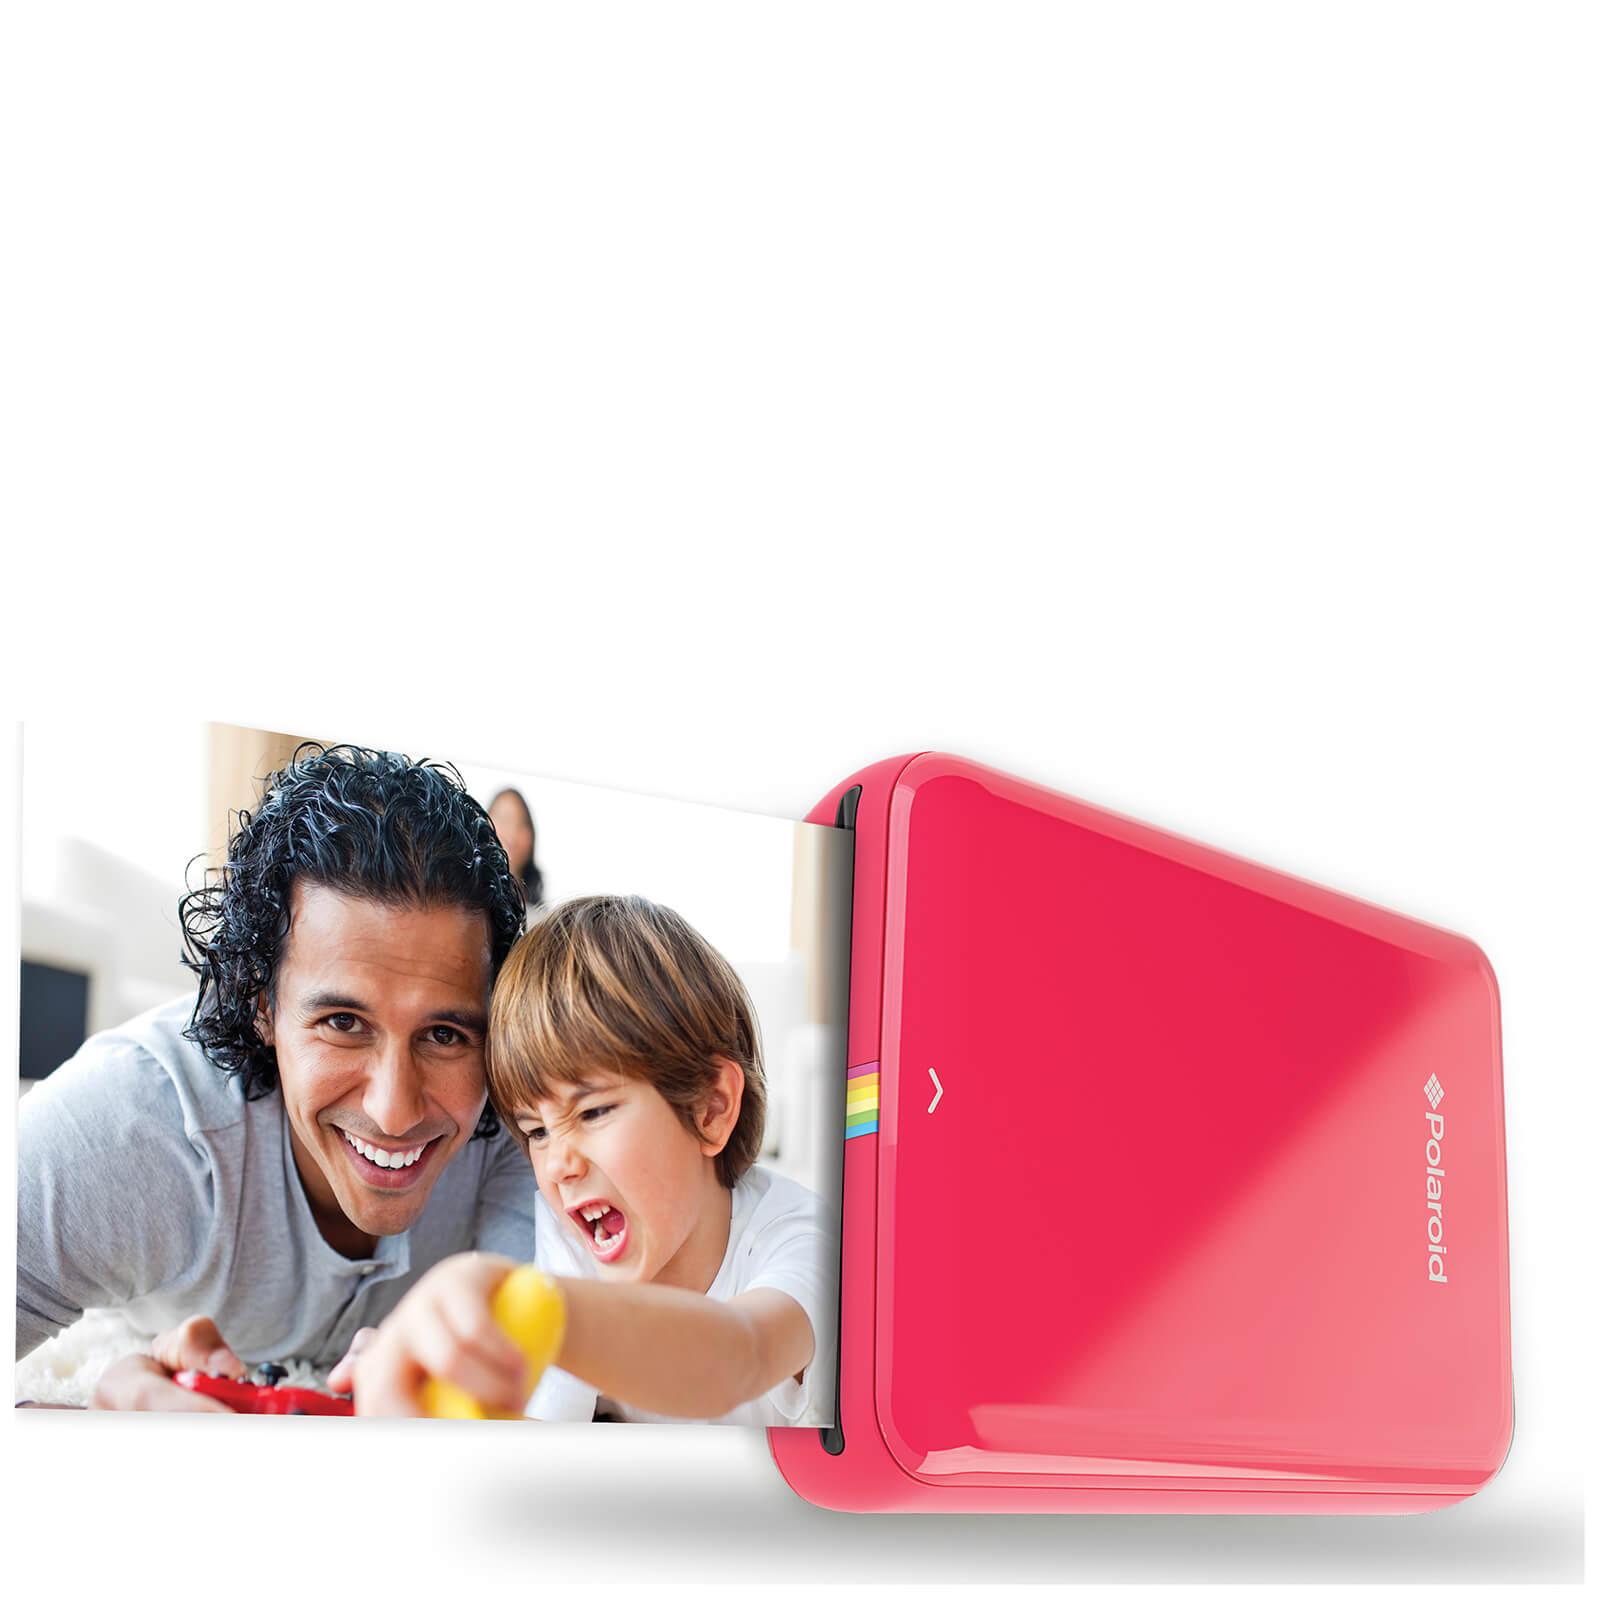 Polaroid Zip Bluetooth Instant Mobile Printer - Red